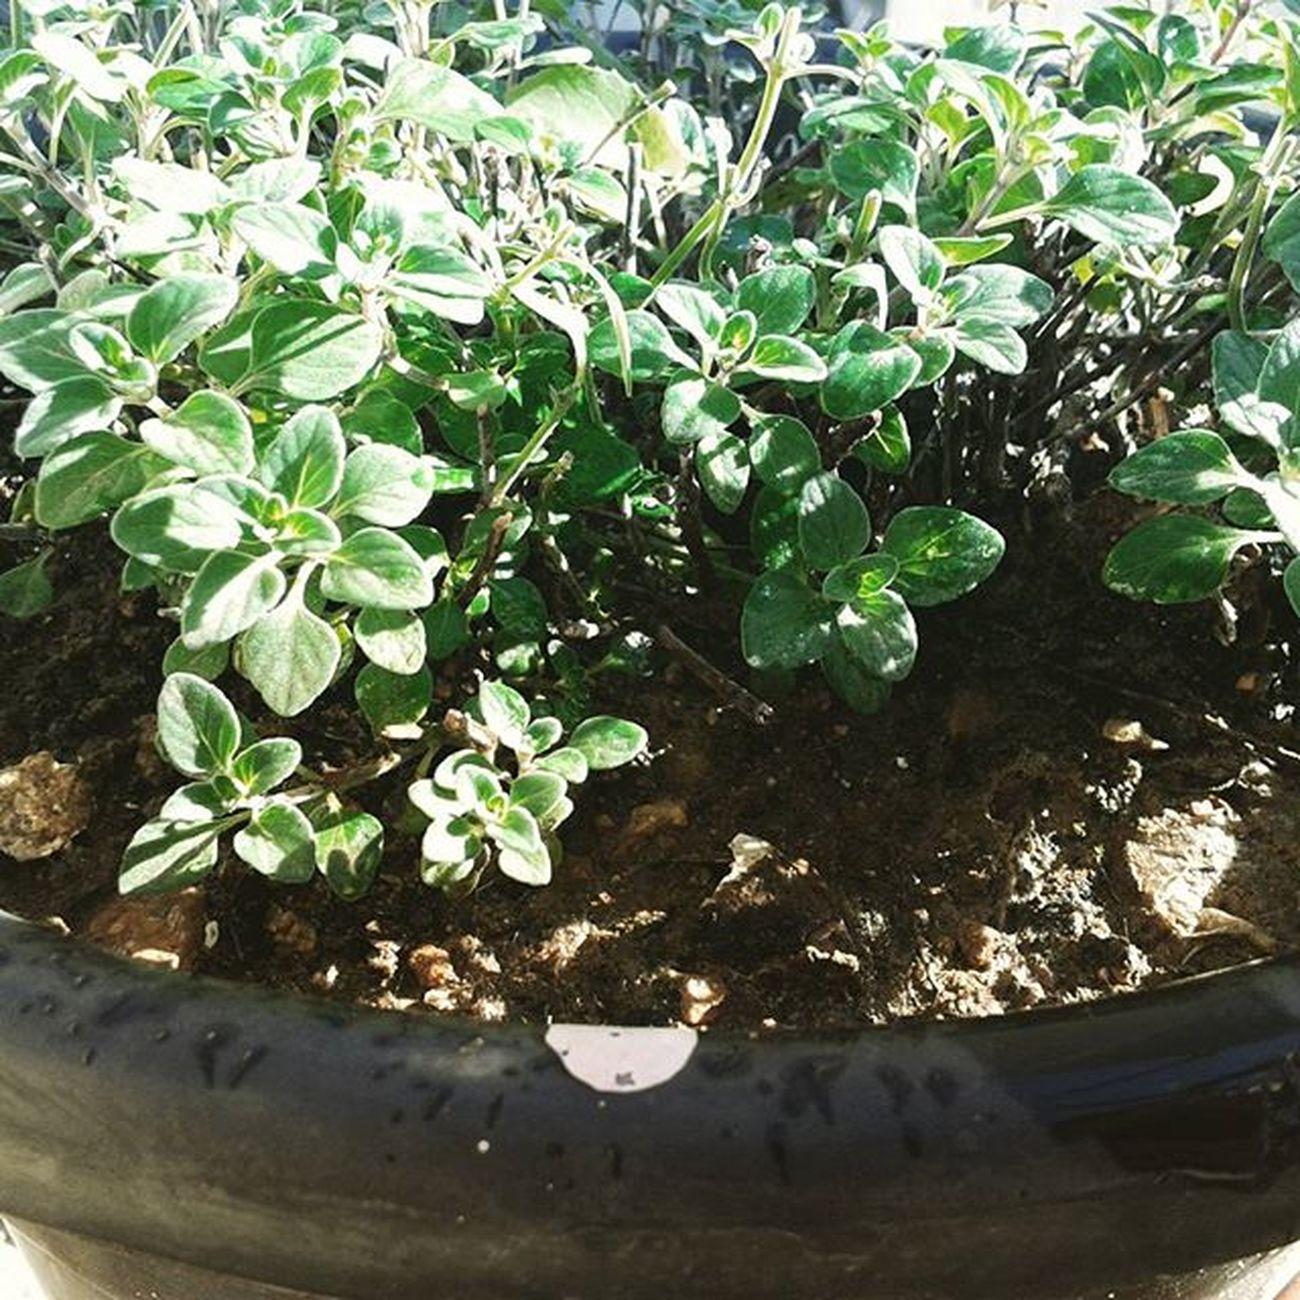 نباتات شاي زعتر جبلي Love Nature Tag Tea Trees